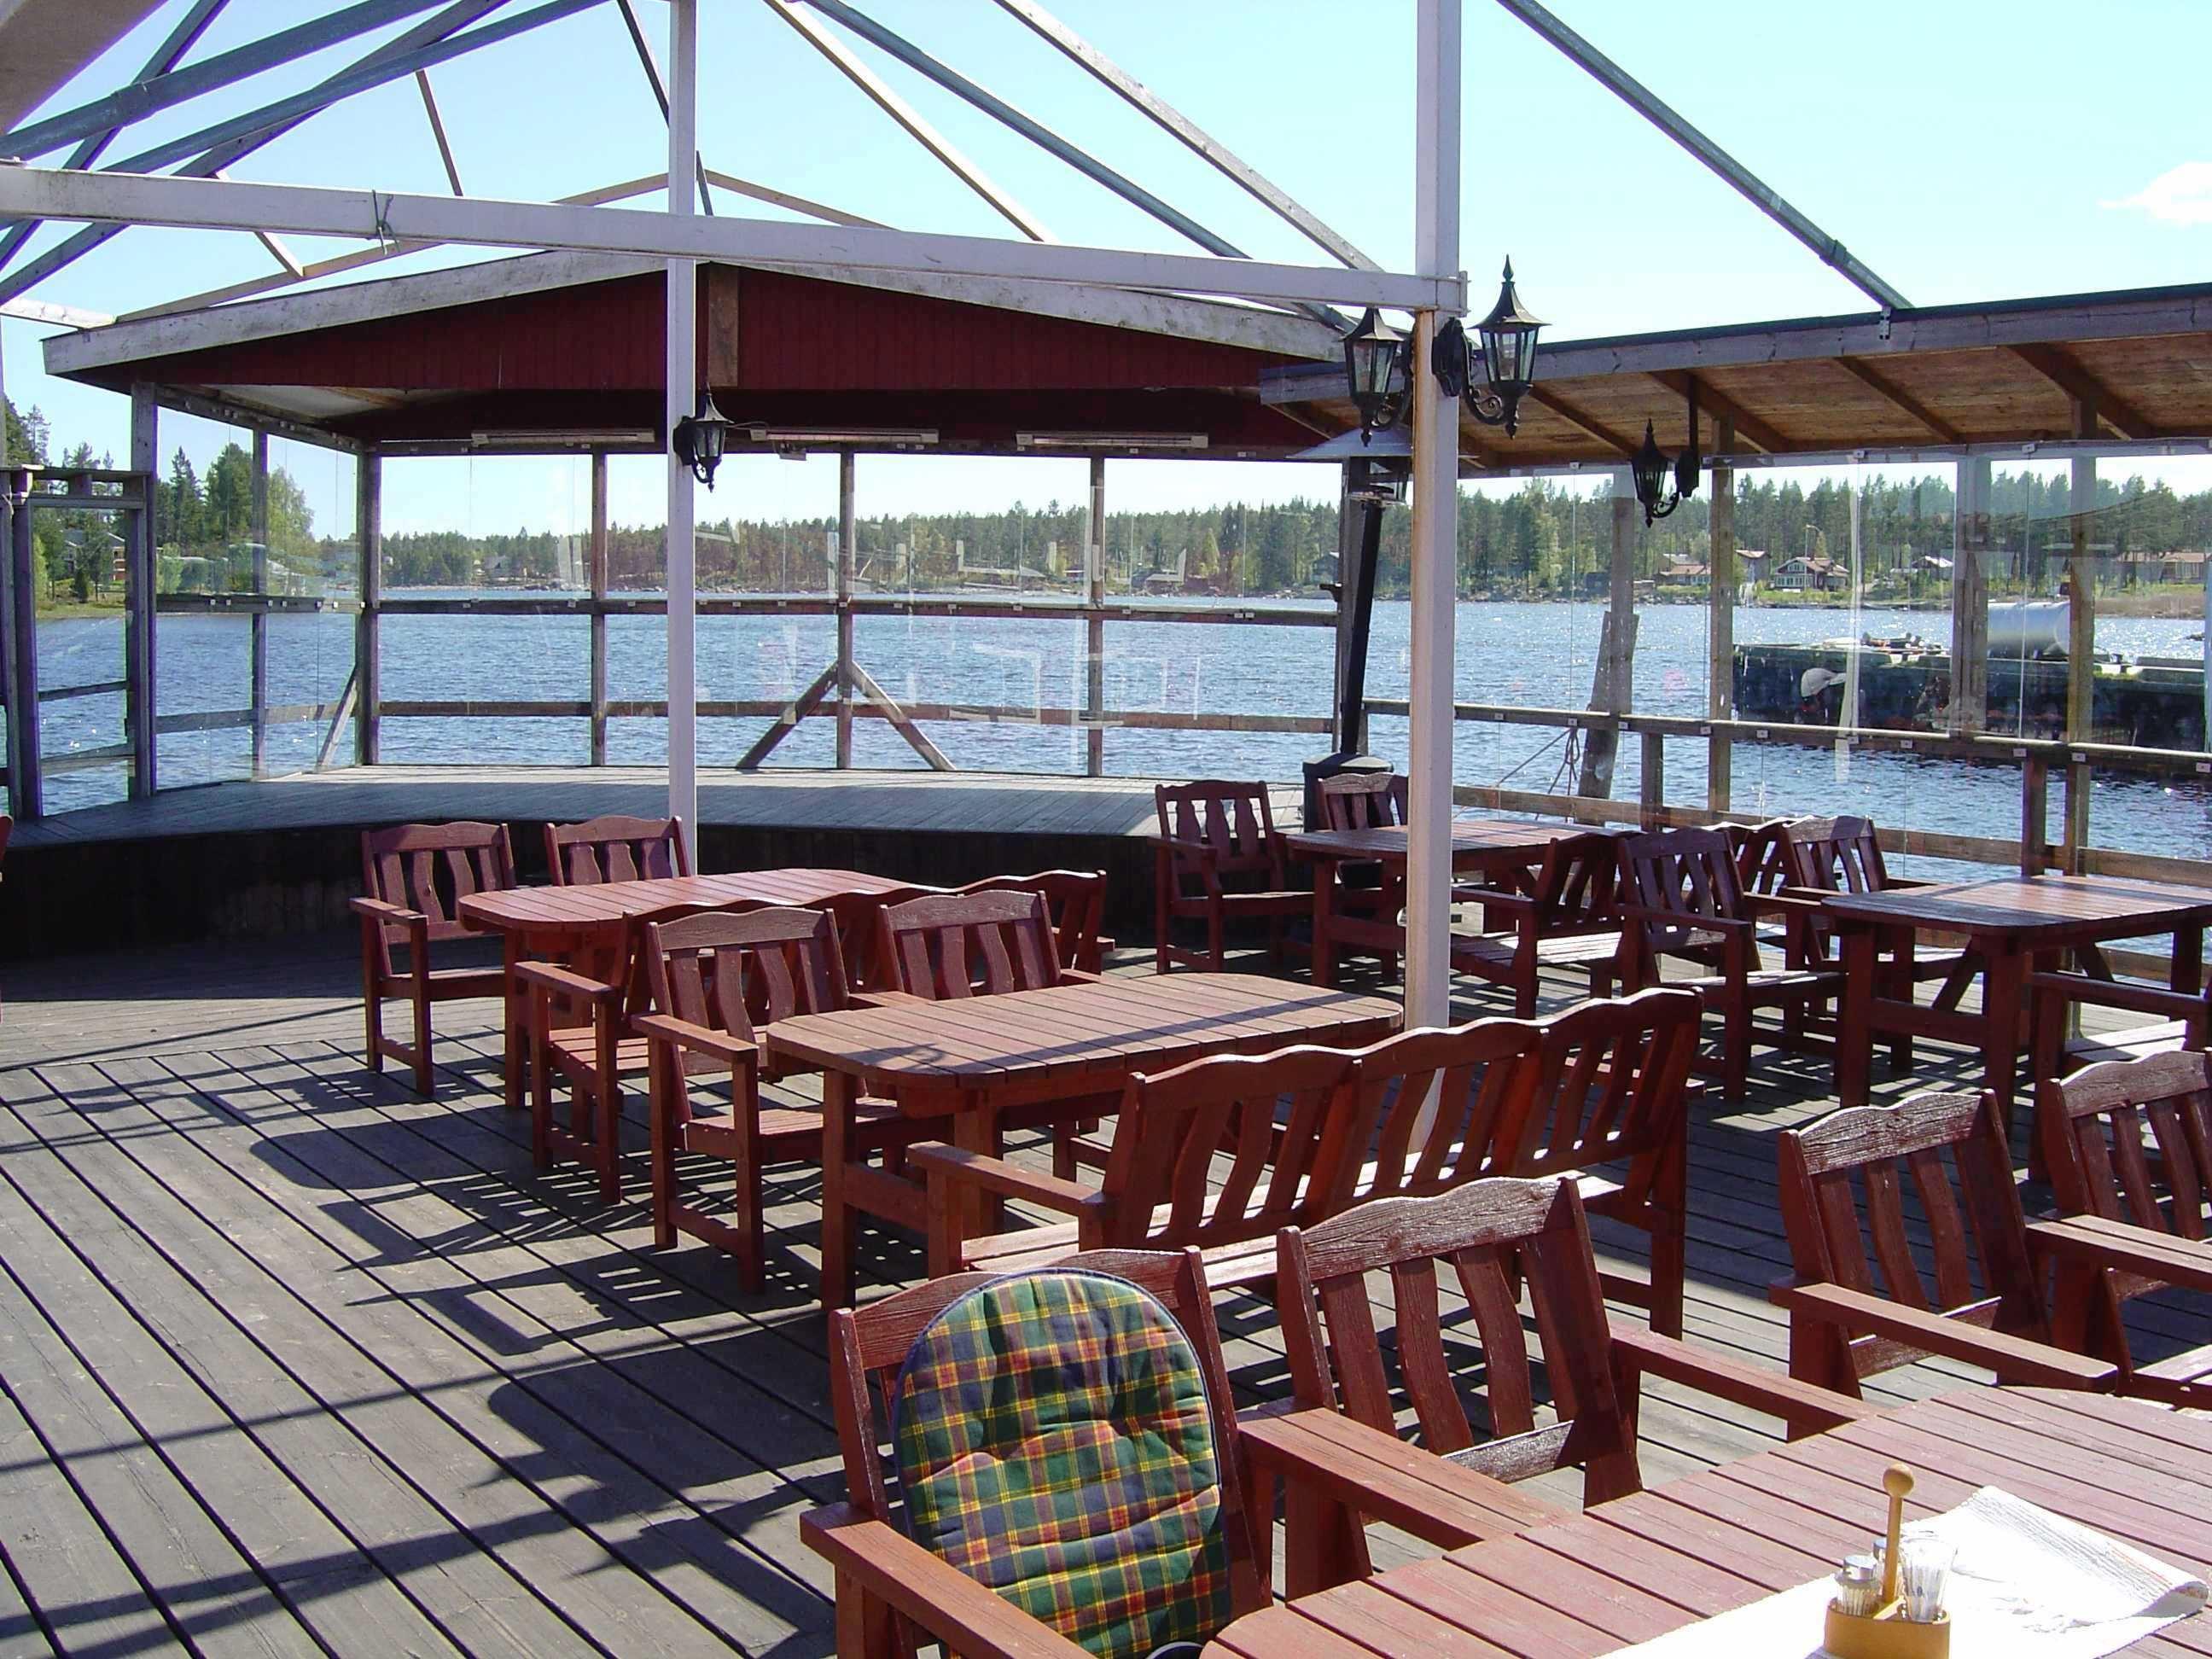 Restaurang Sjömärket,  © Restaurang Sjömärket, Restaurang Sjömärket